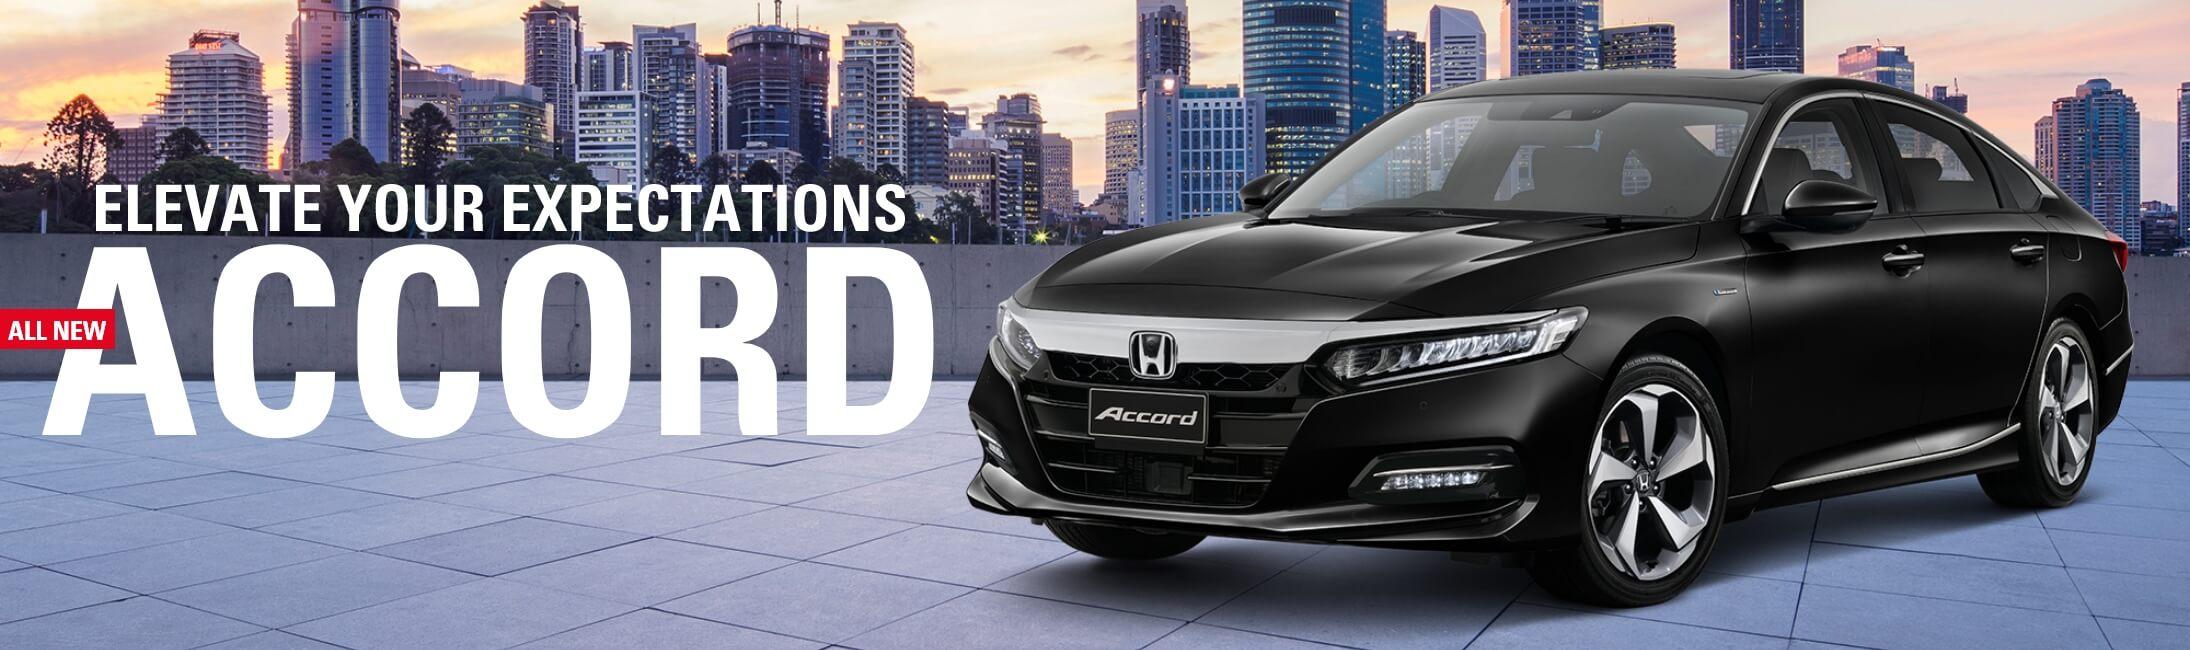 Honda - All New Accord